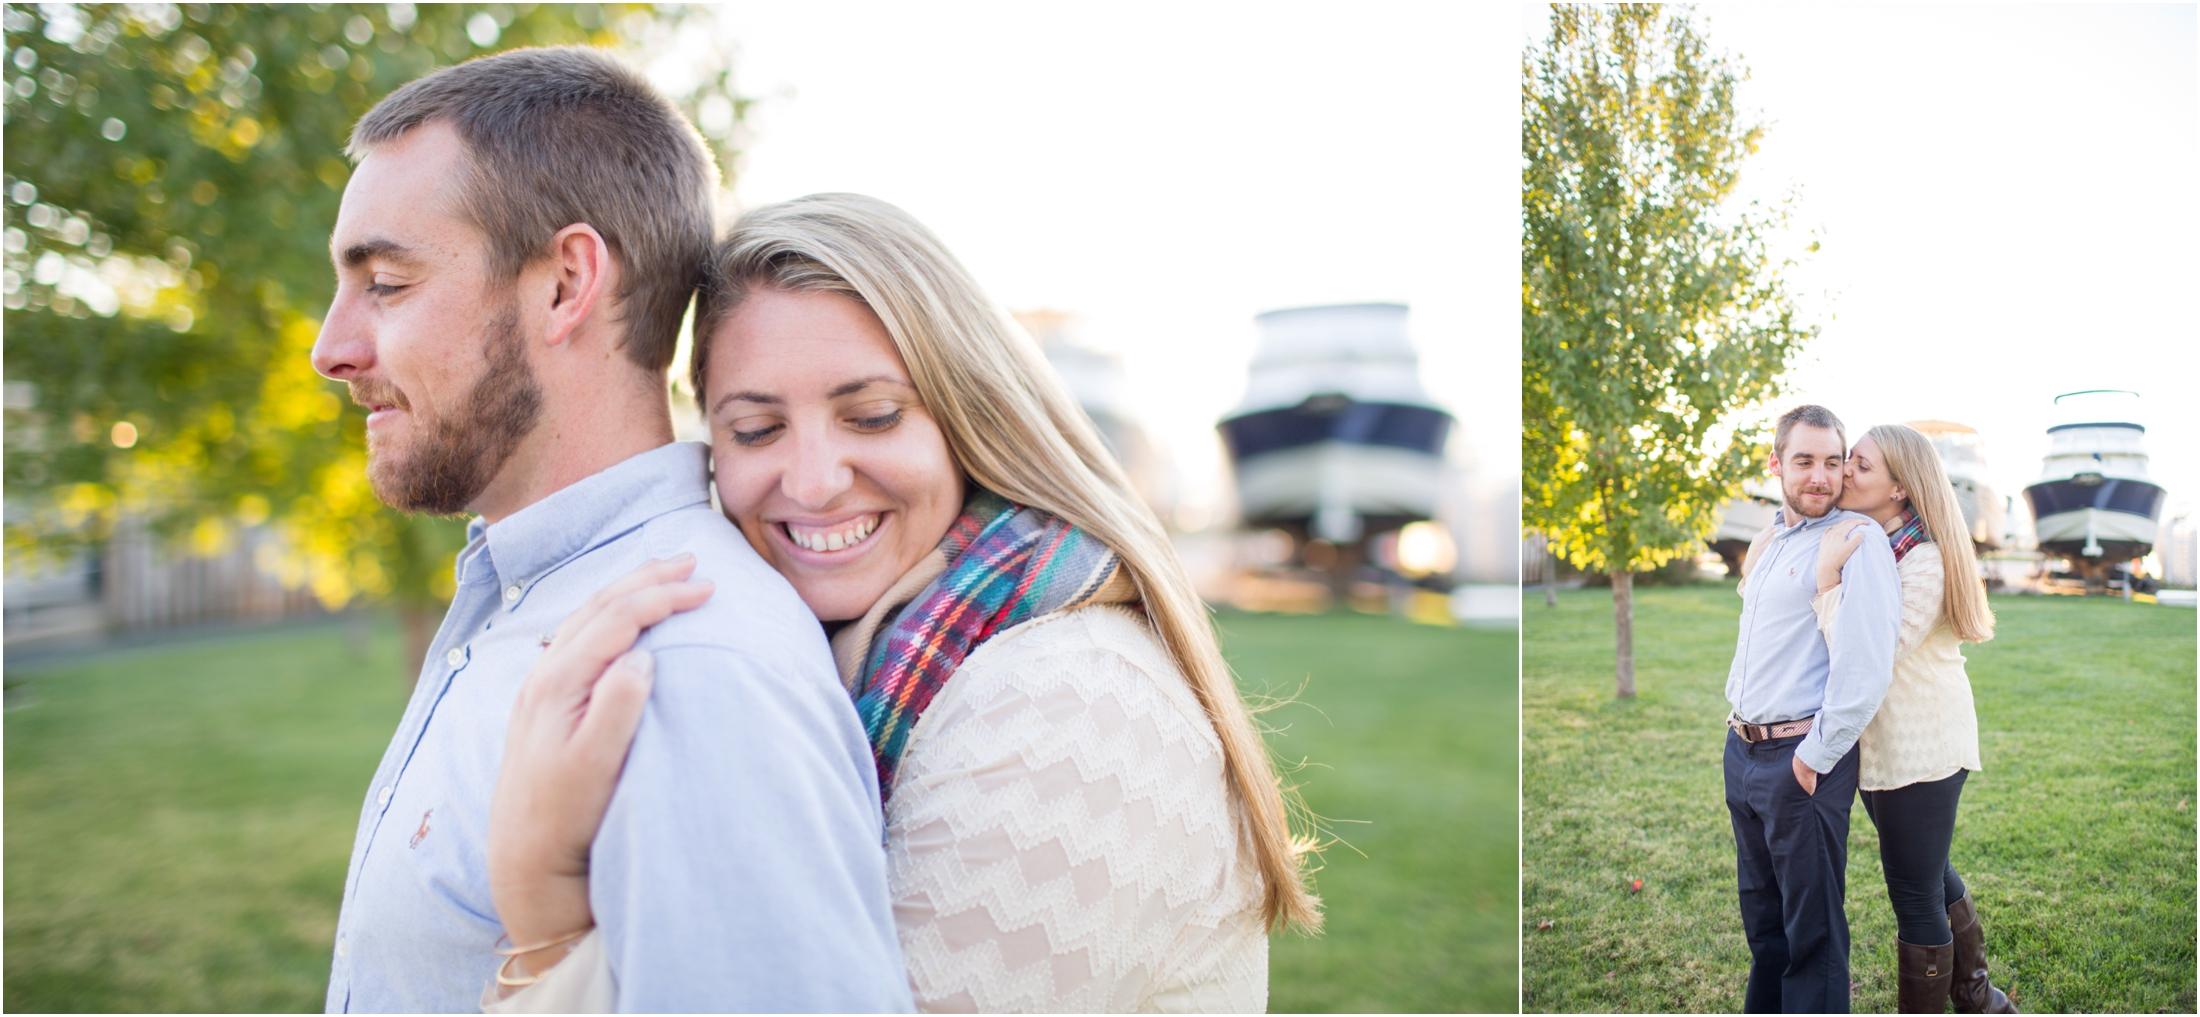 Morgan-Zach-Engaged-185.jpg